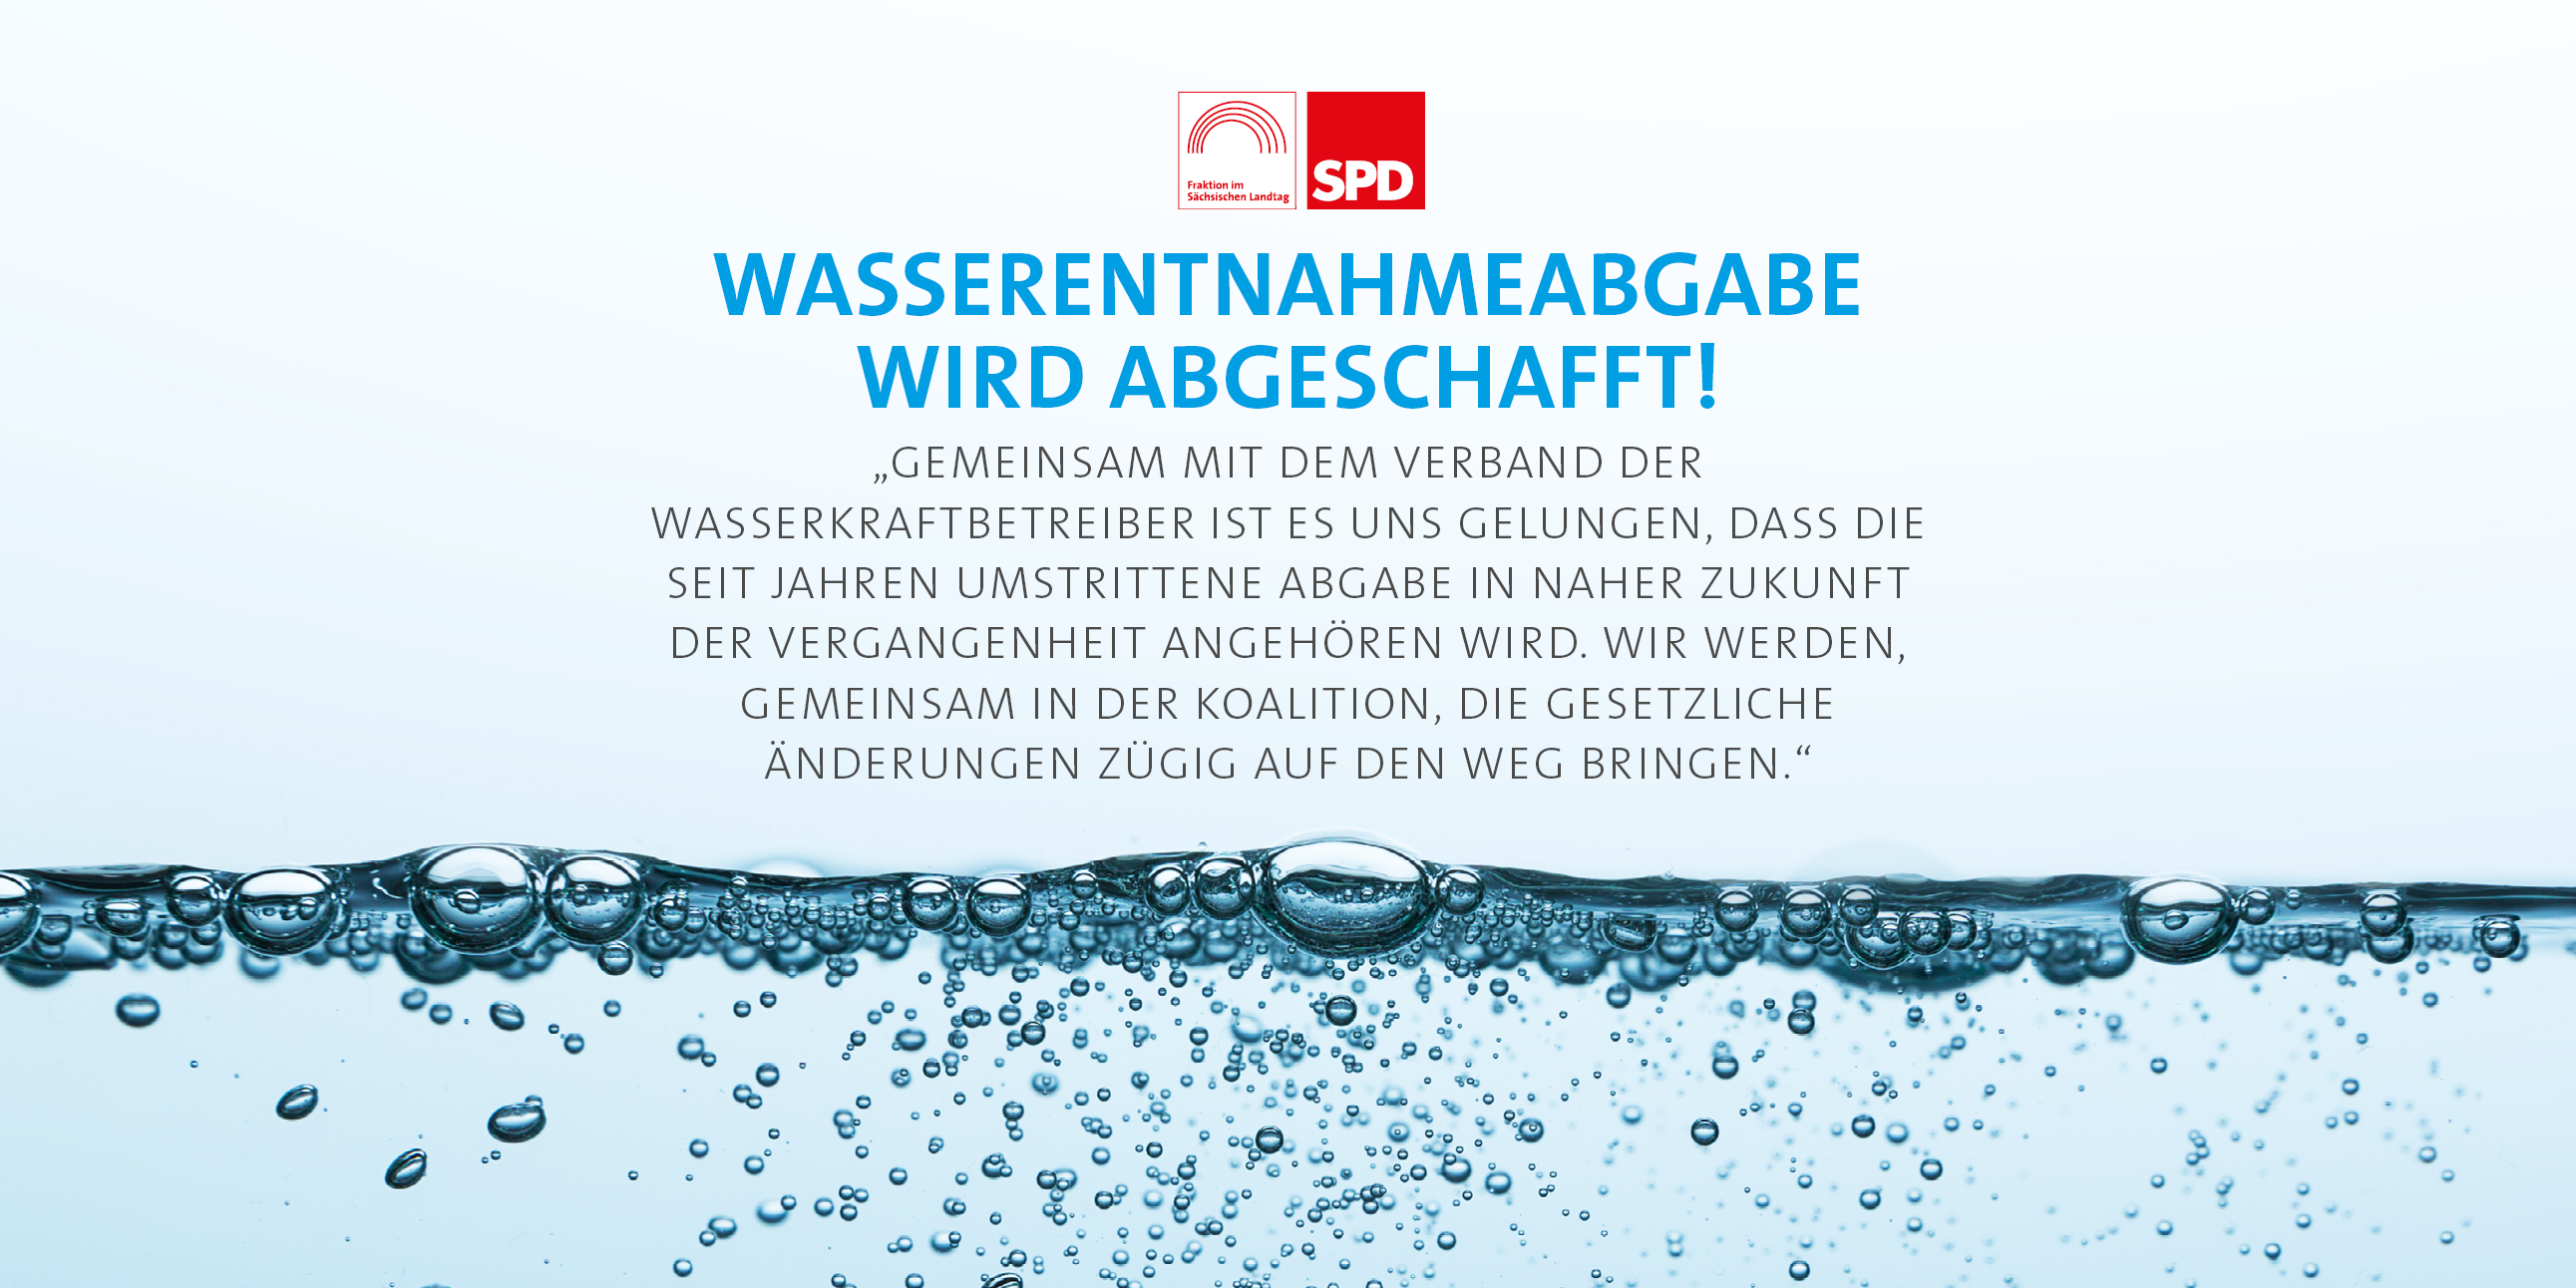 Wasserentnahmeabgabe wird abgeschafft